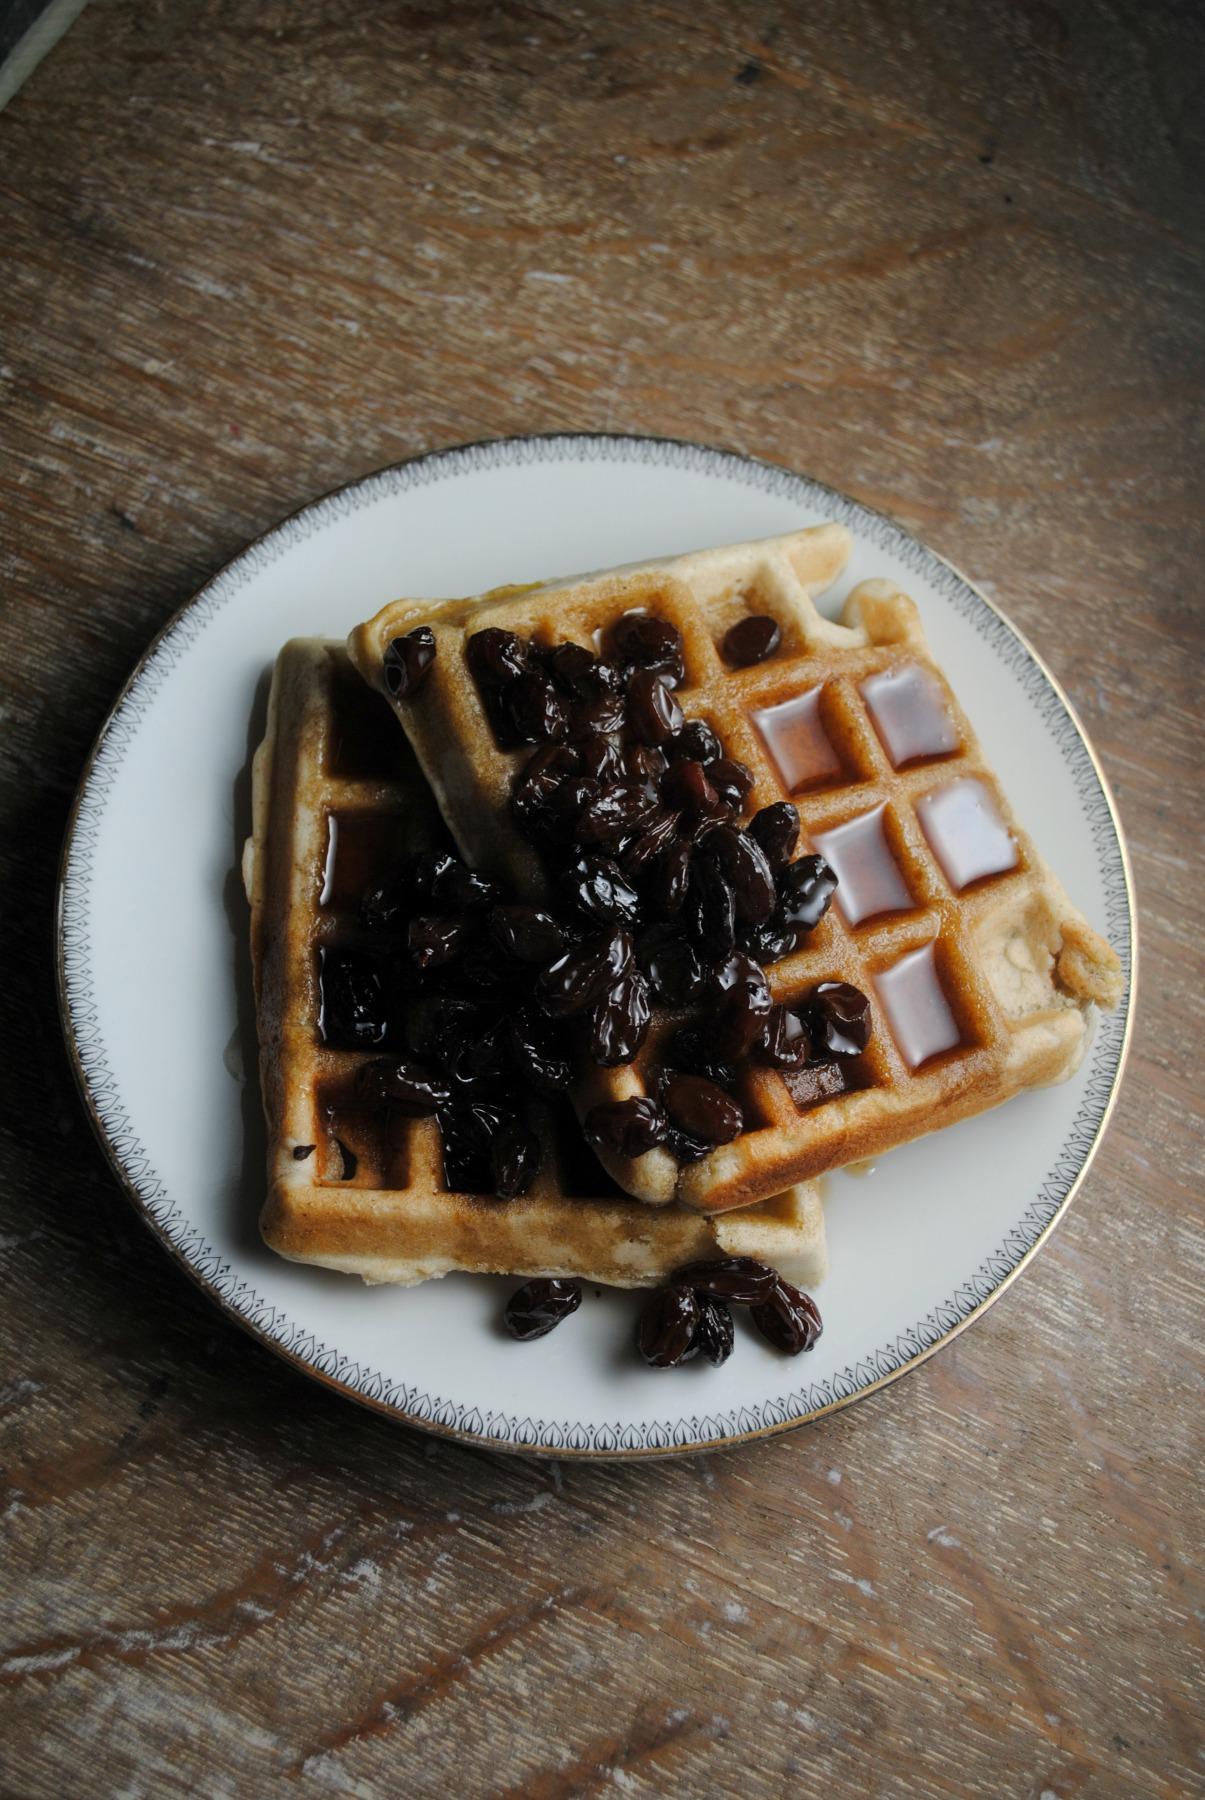 banana-bread-waffles-bourbon-raisin-syrup-VianneyRodriguez